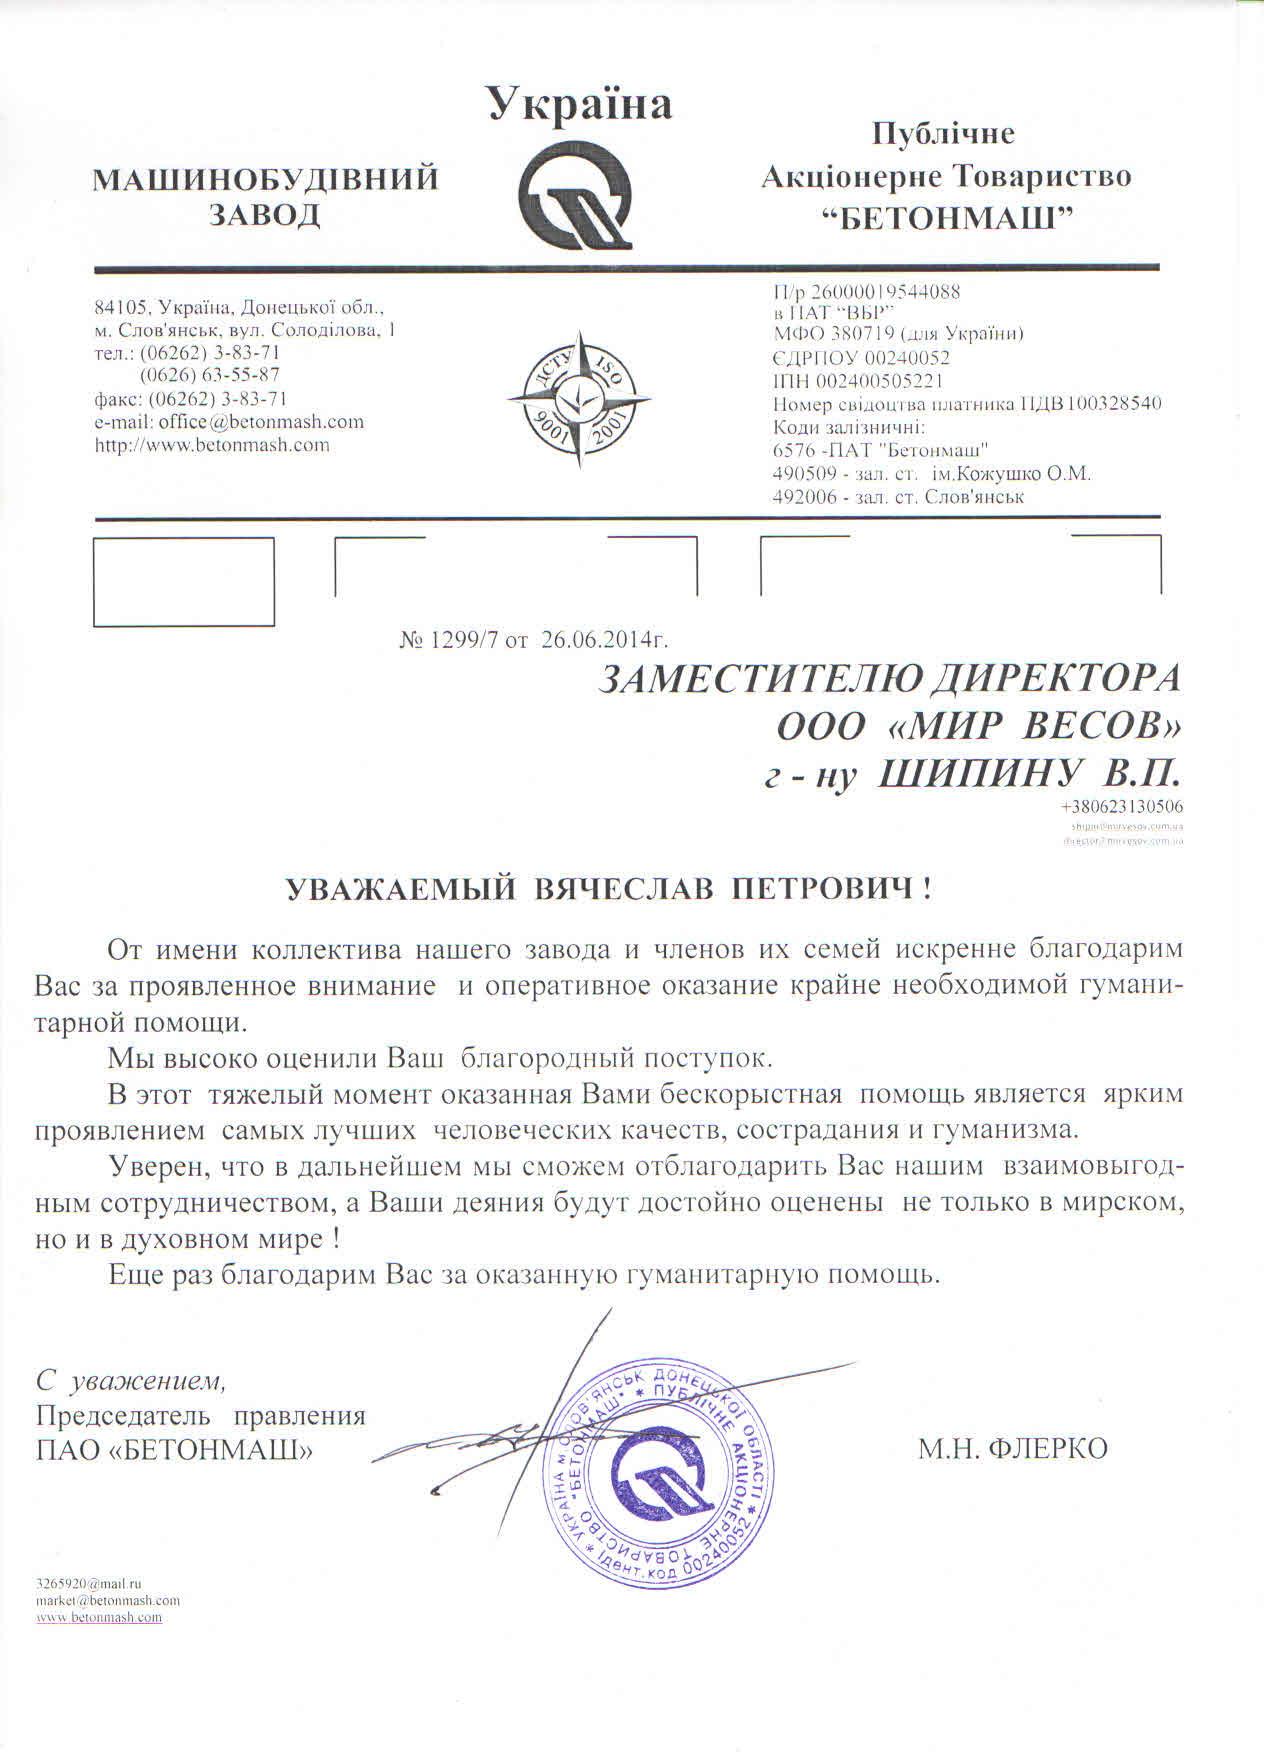 Гуманитарная катастрофа: ПАО «Бетонмаш». Протяните руку помощи!